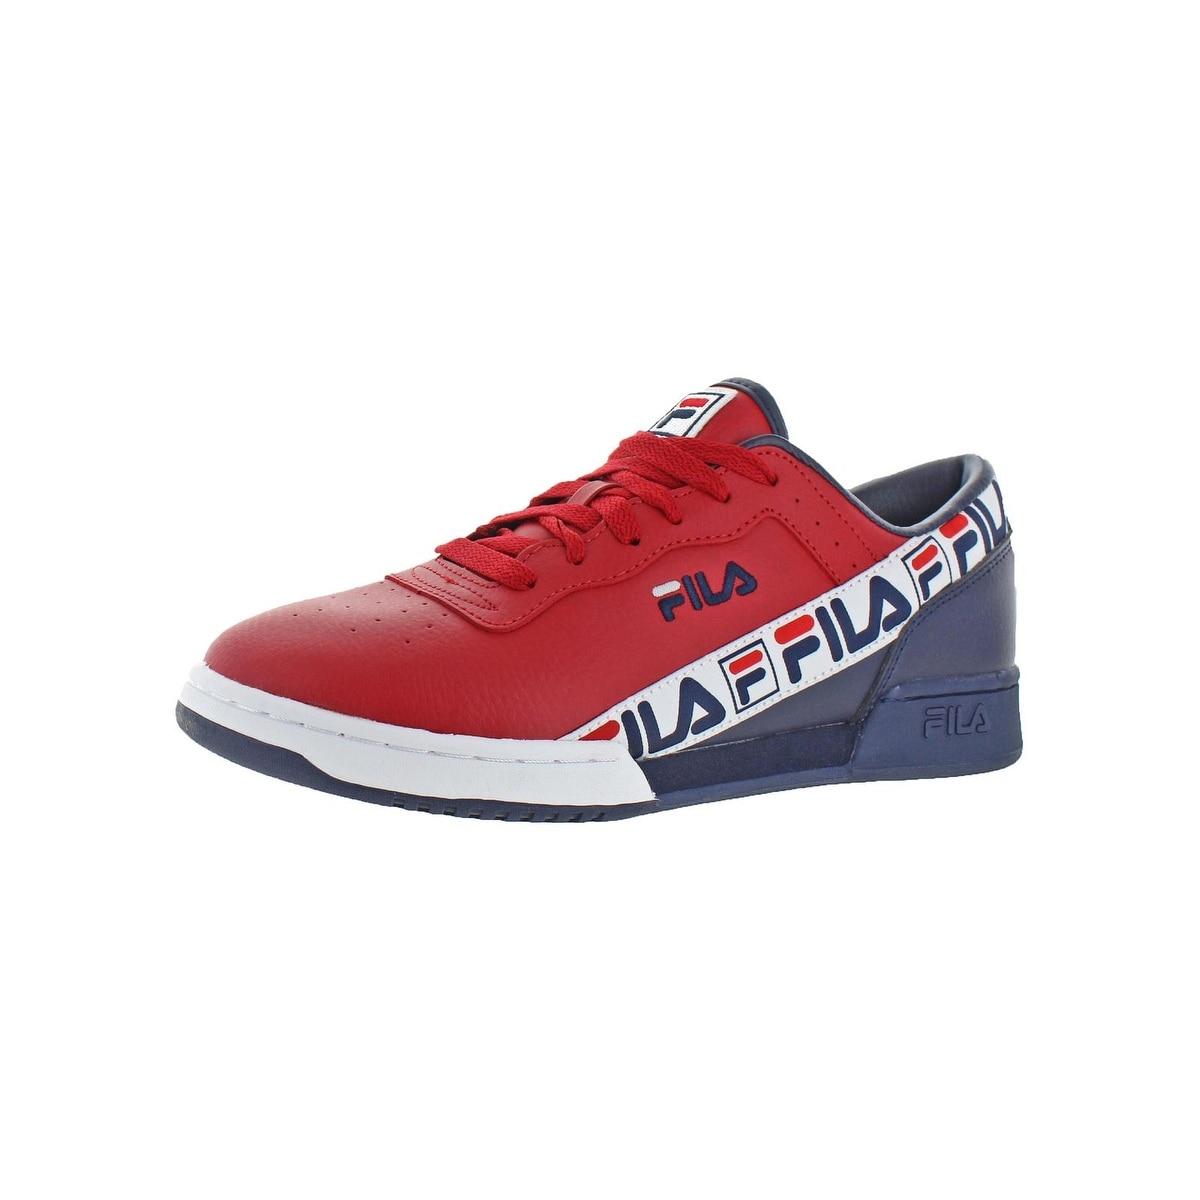 6528a94b397c Fila Men s Shoes